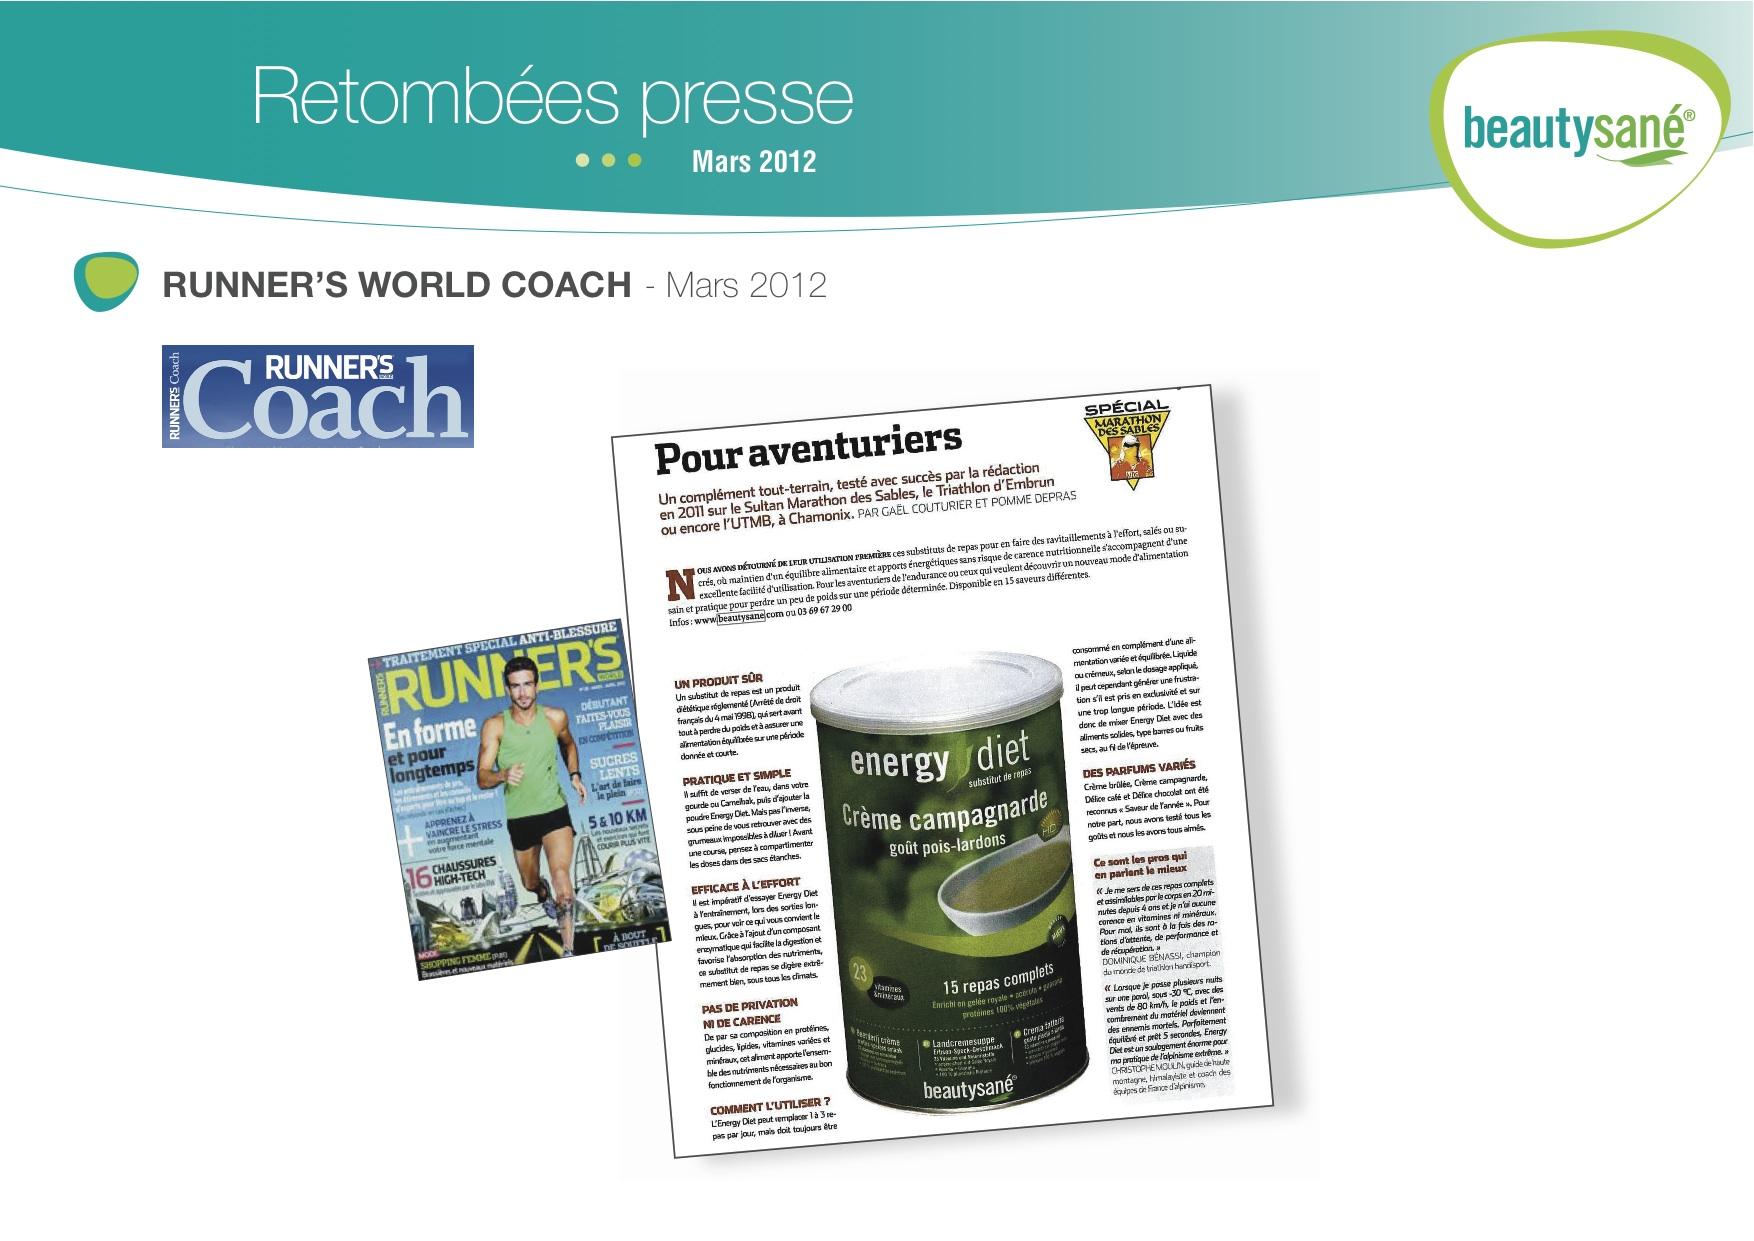 rp_bs-mar2012-runnersworldcoach